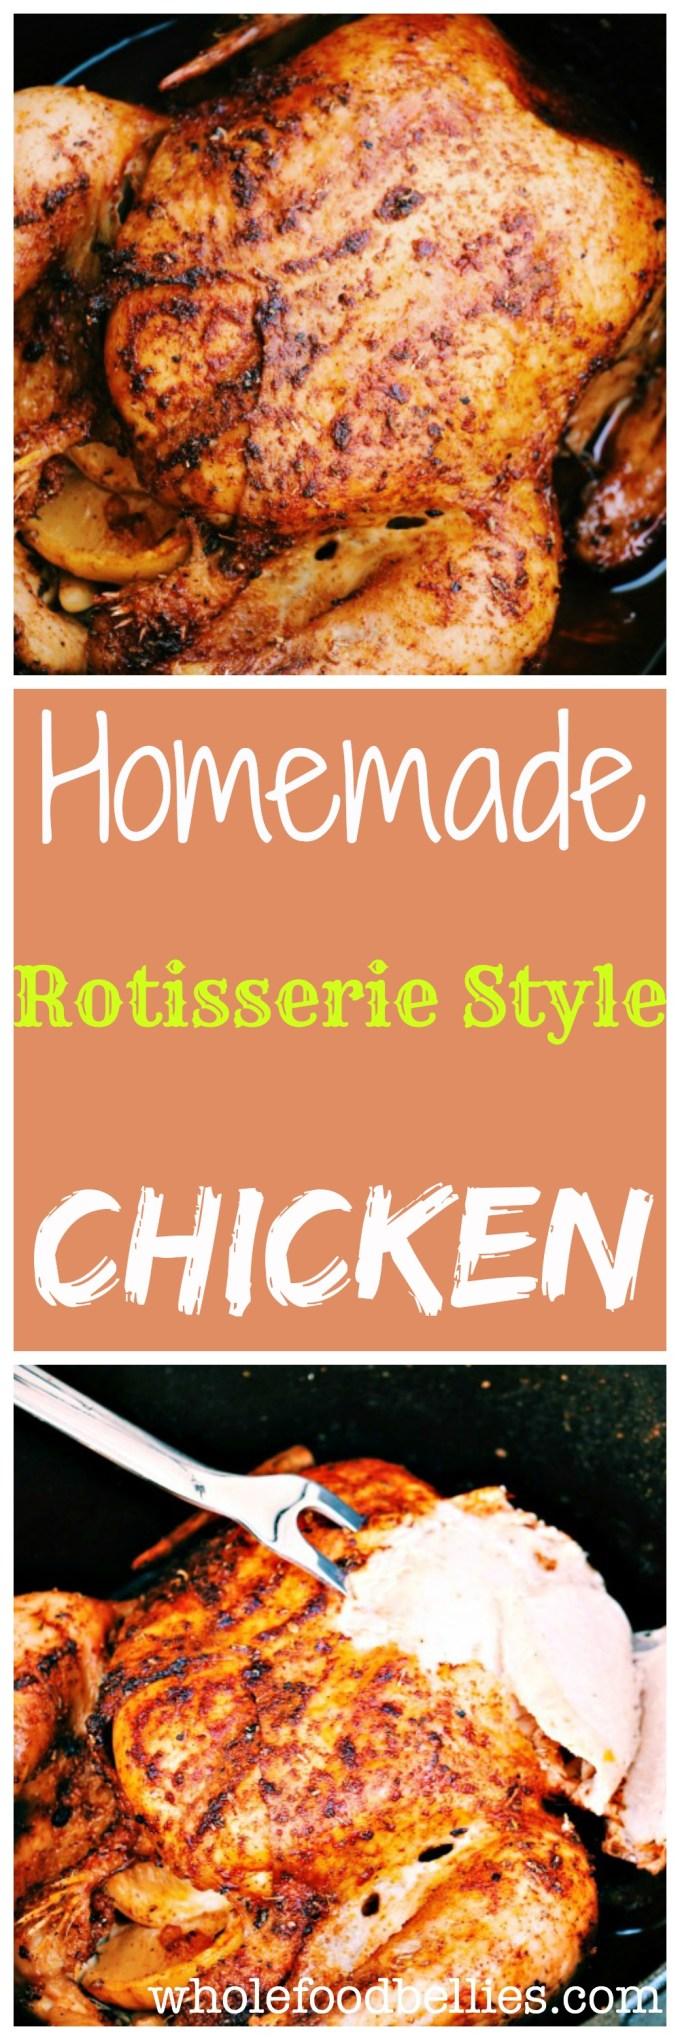 Rotisserie Style Chicken Pinnable Image @wholefoodbellies.com